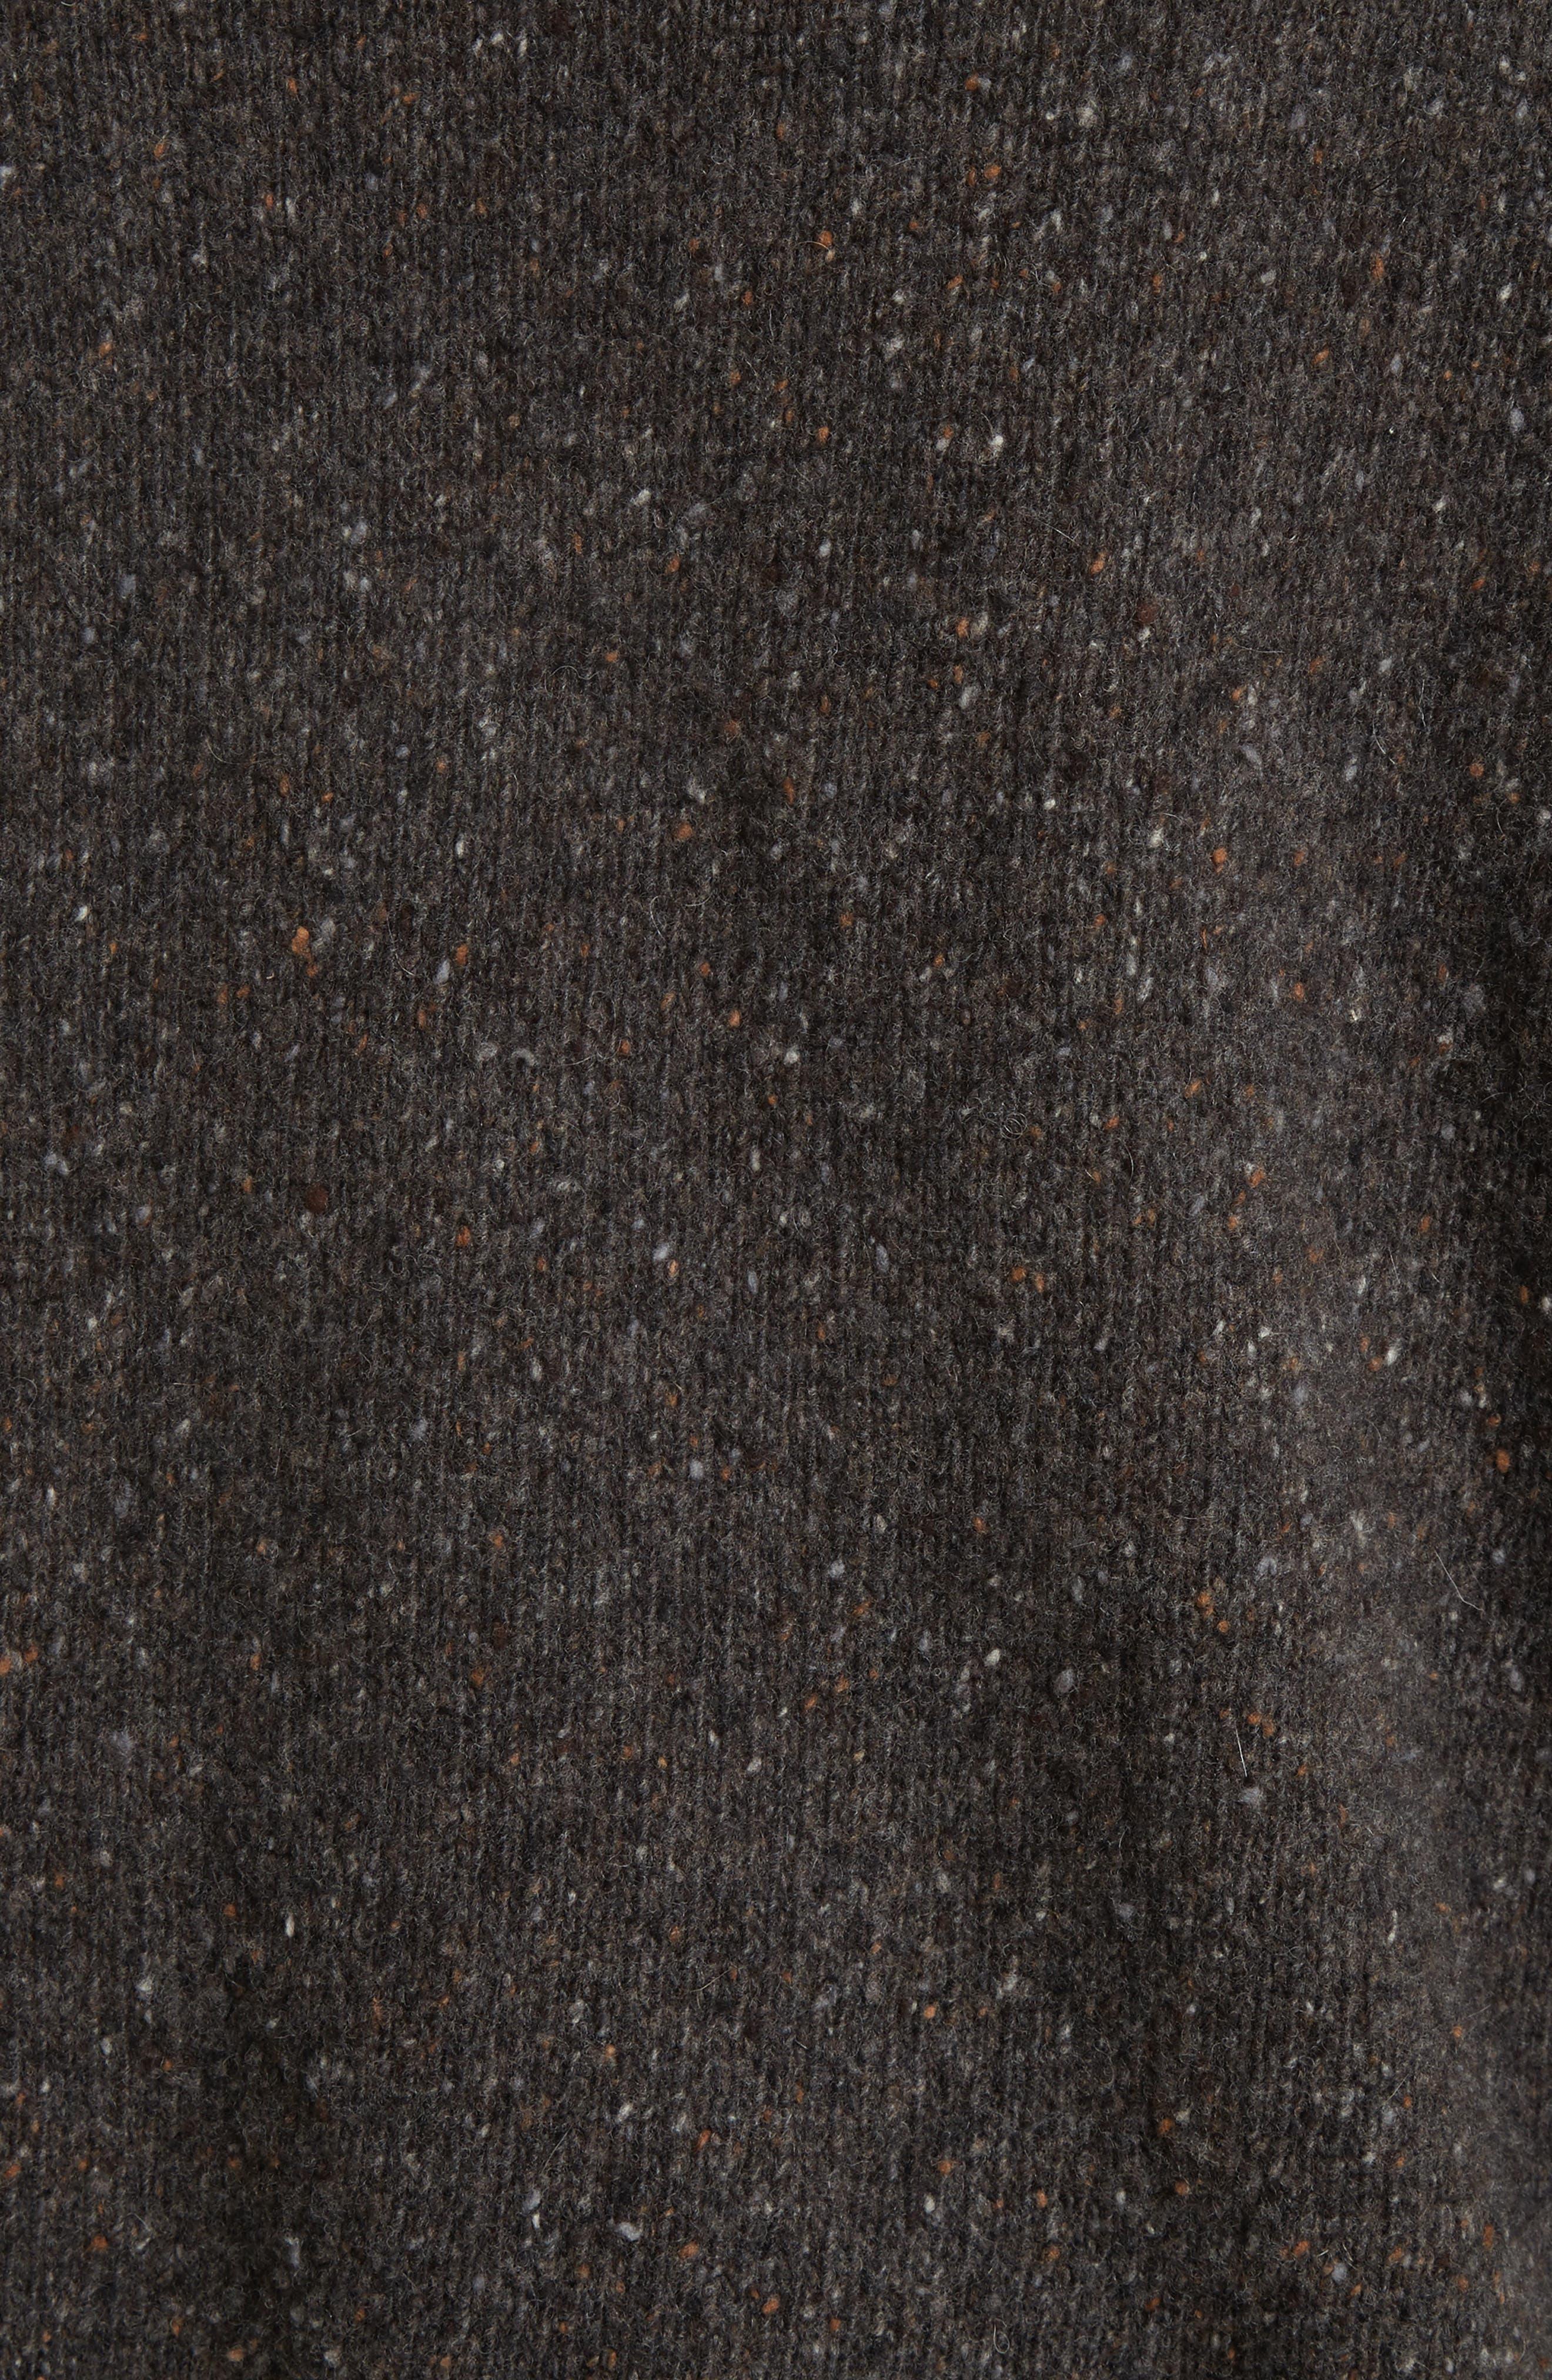 Cashmere Turtleneck Sweater,                             Alternate thumbnail 5, color,                             060